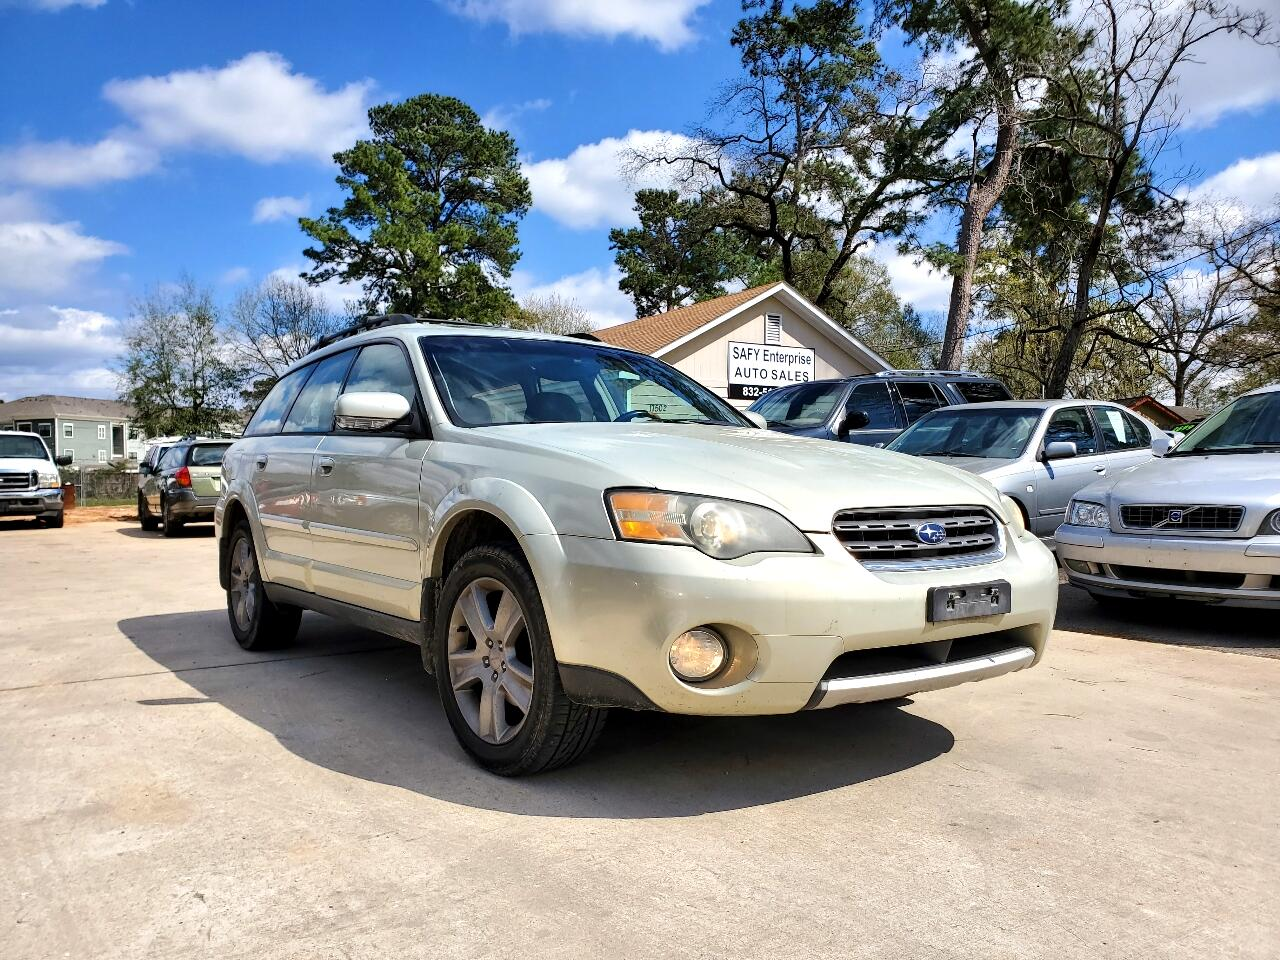 Subaru Legacy Wagon (Natl) Outback 3.0 R L.L. Bean Edition 2005